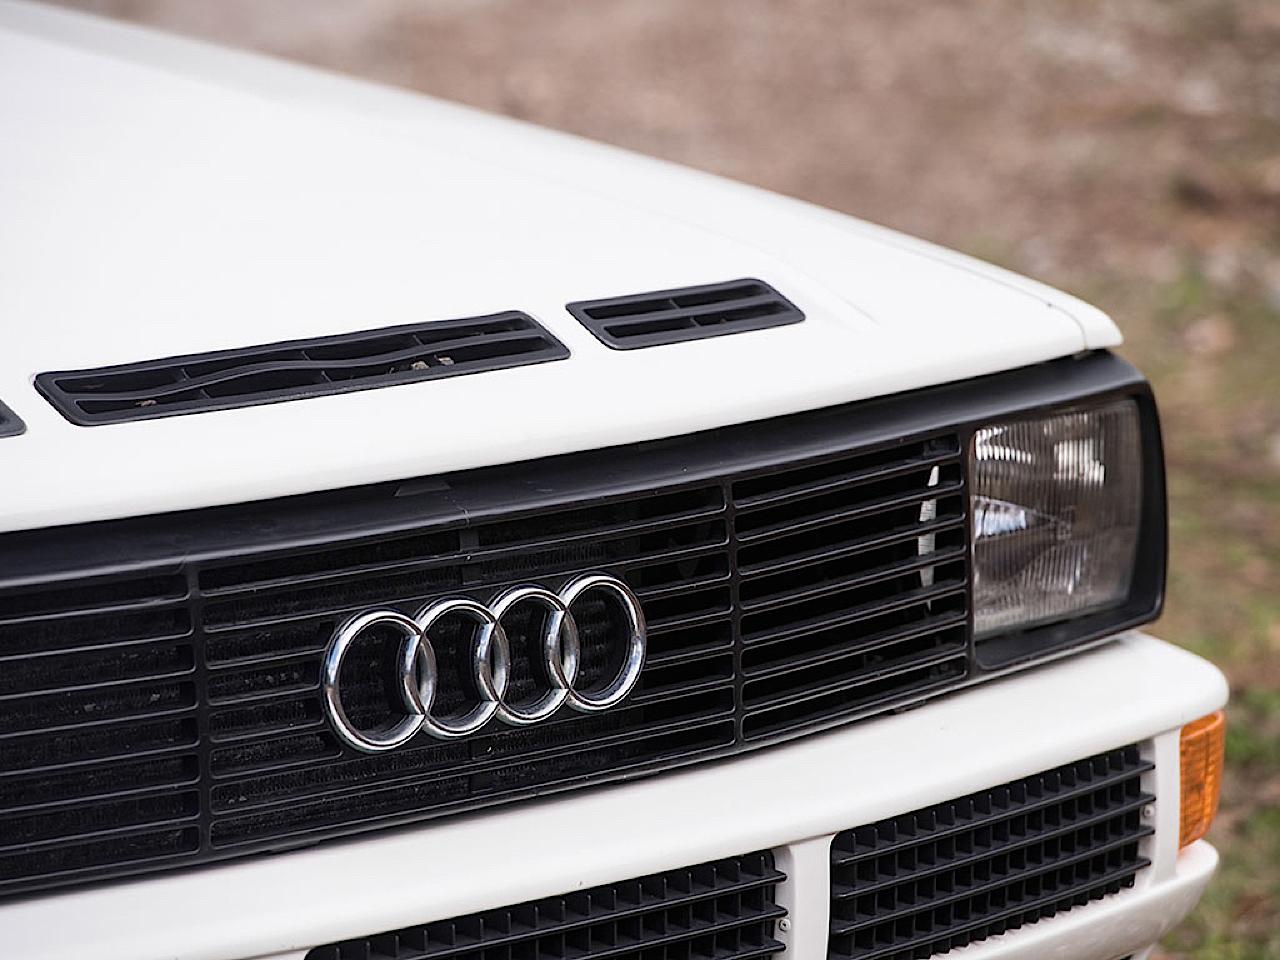 Audi Quattro Sport - Châssis court, turbo et muscu ! 26